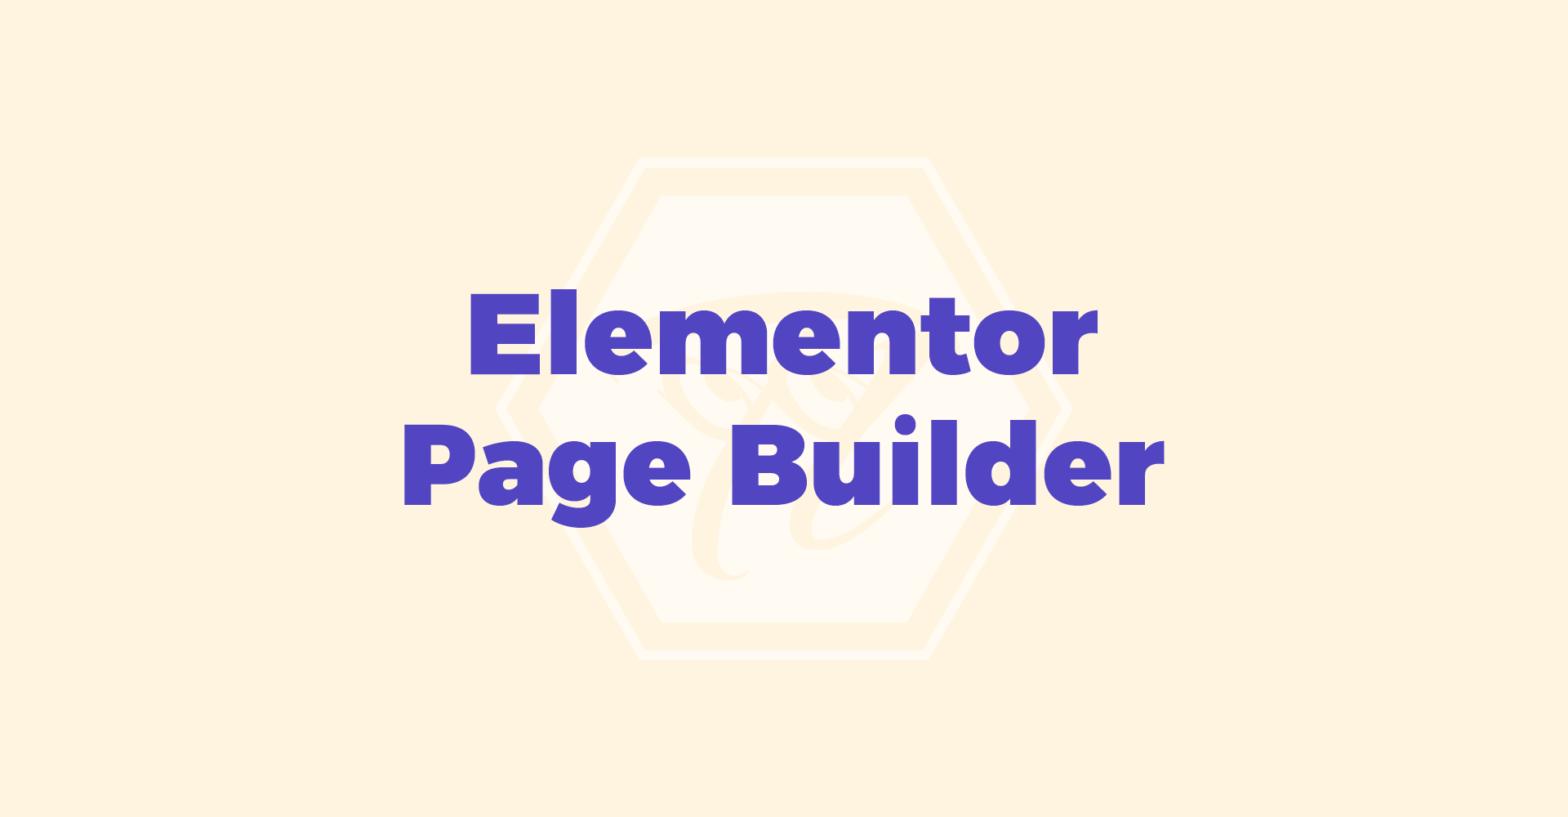 elementor_page_bulder 1568x817